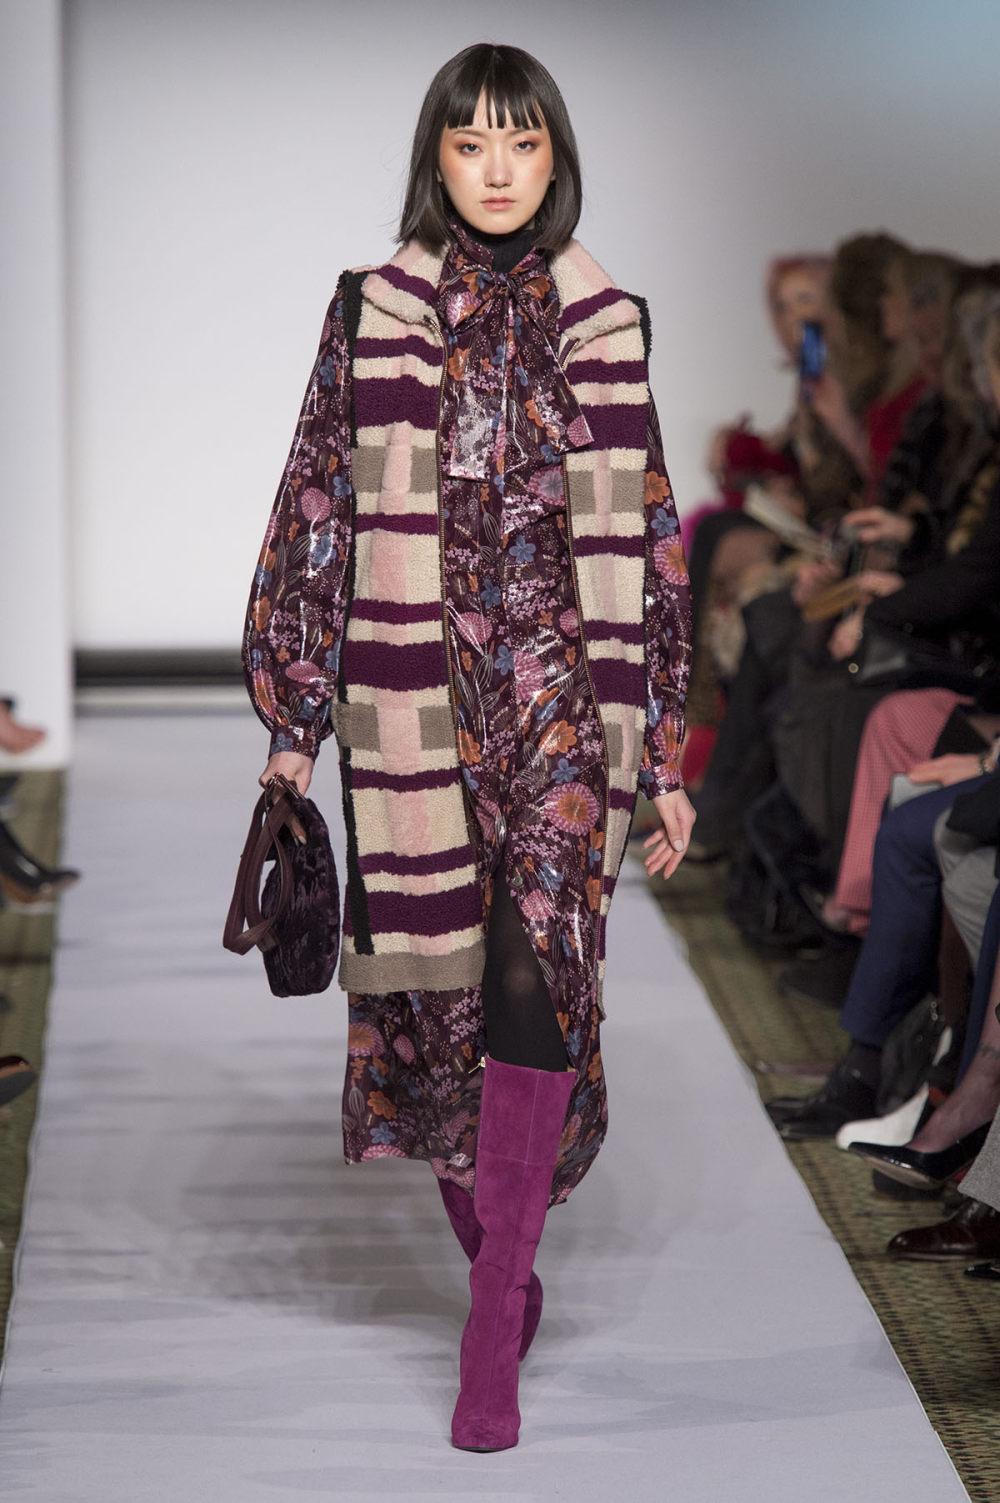 Carolina Herrera时装系列用鲜艳的颜色充满智能的黑白色调-23.jpg